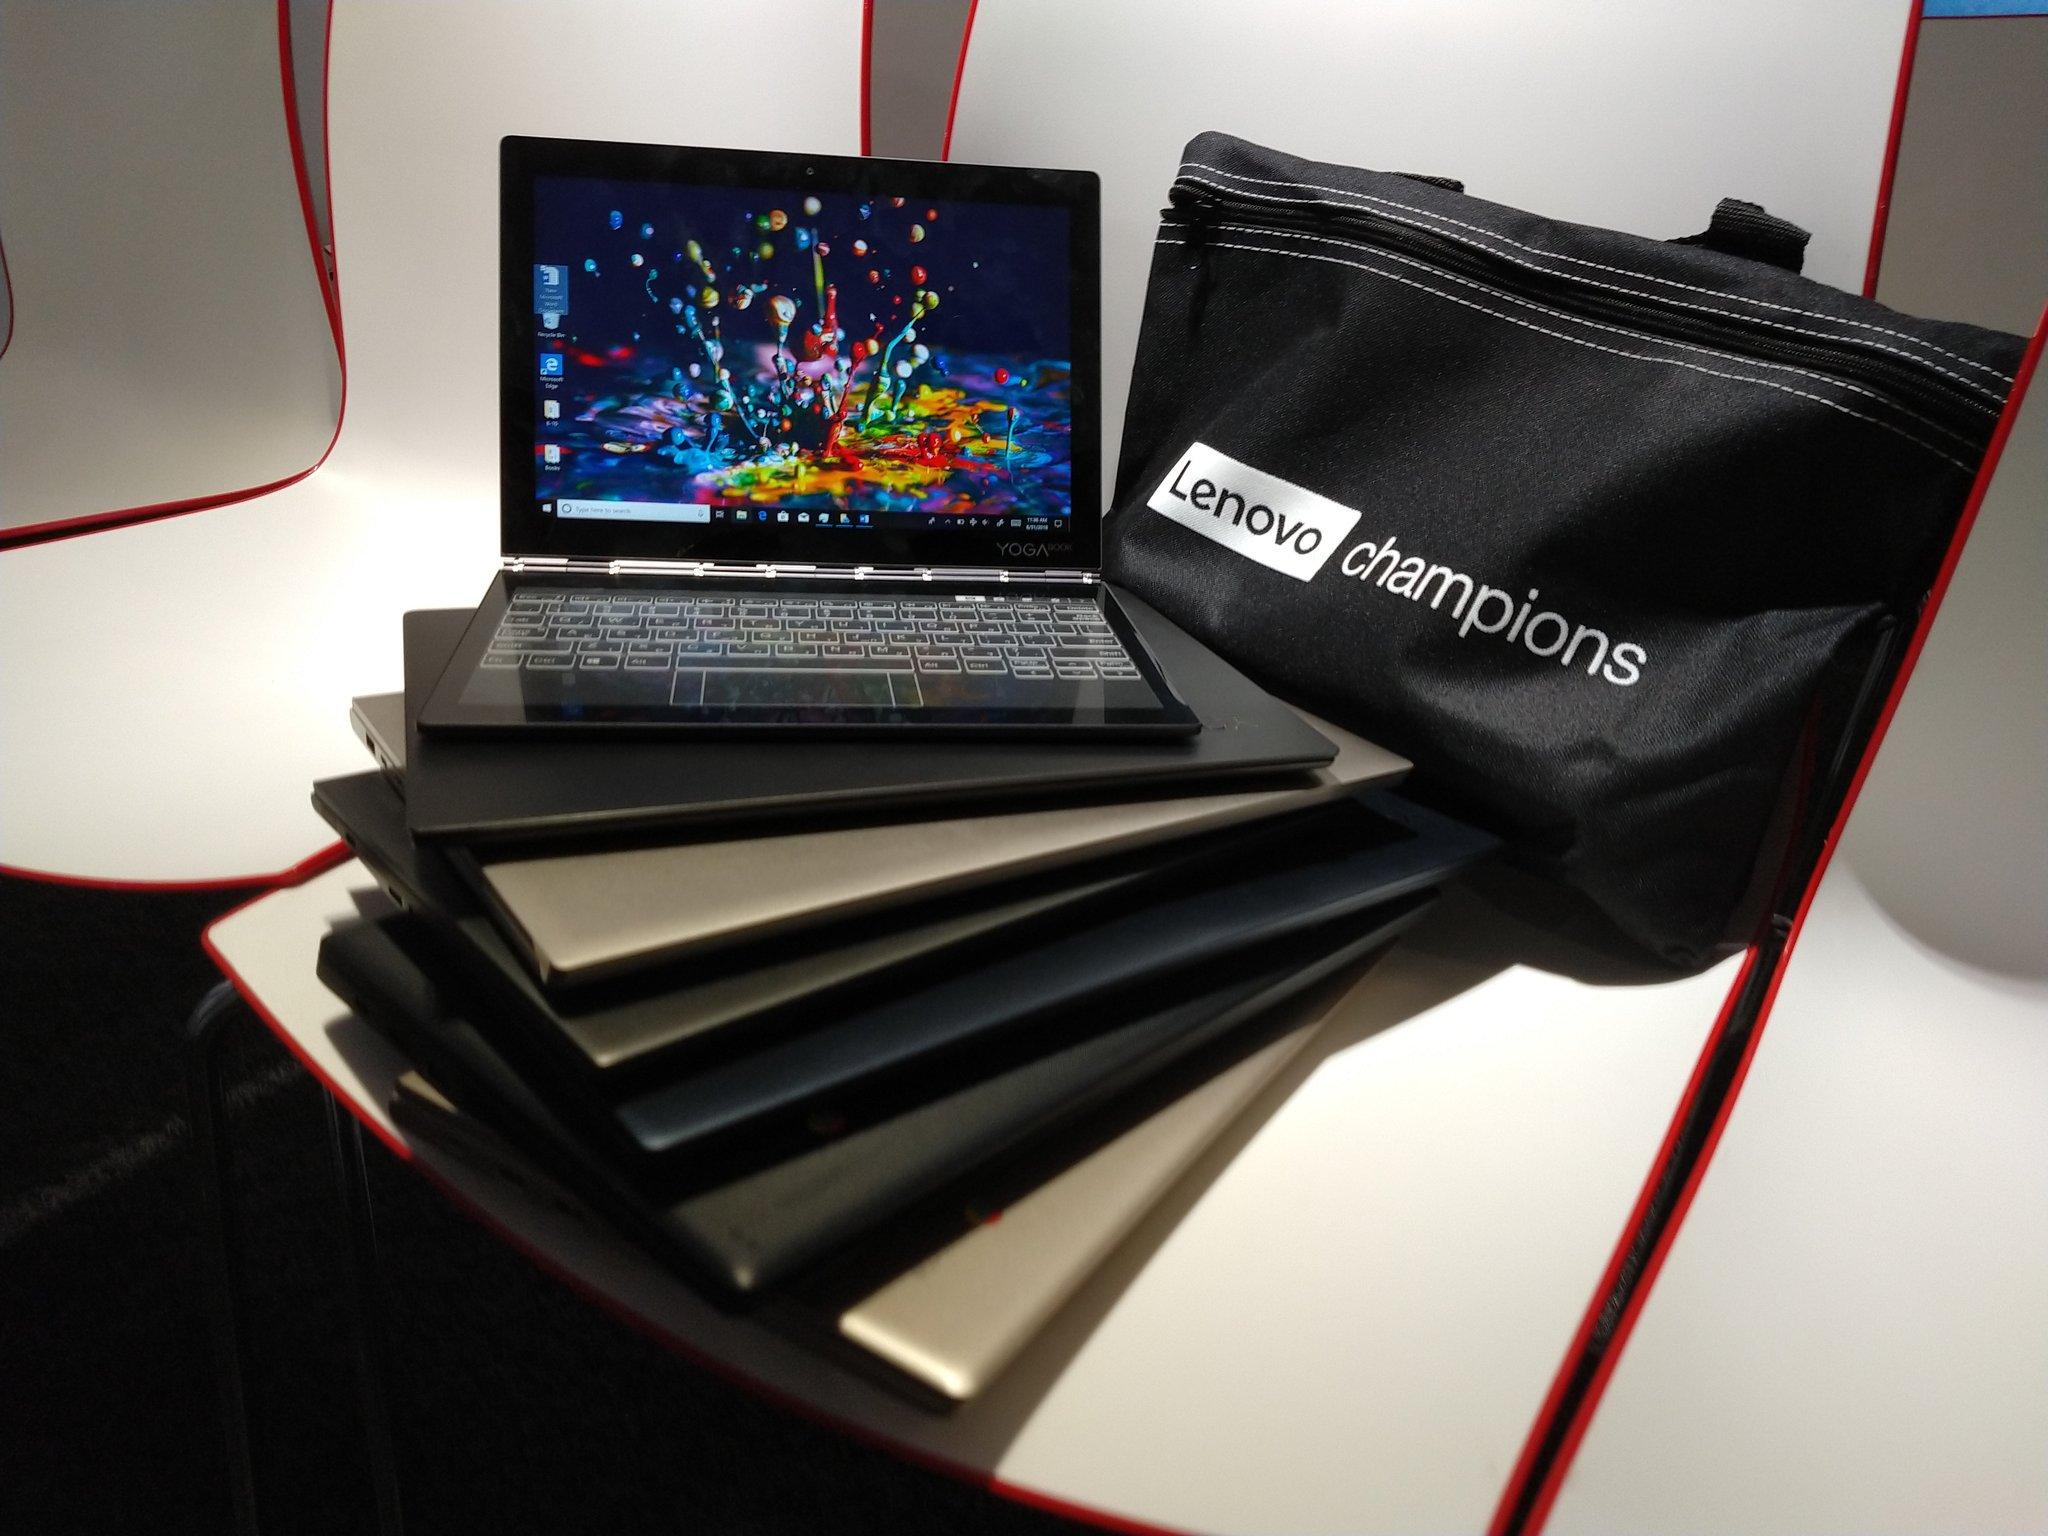 Lenovo Desktop Image Worldwide